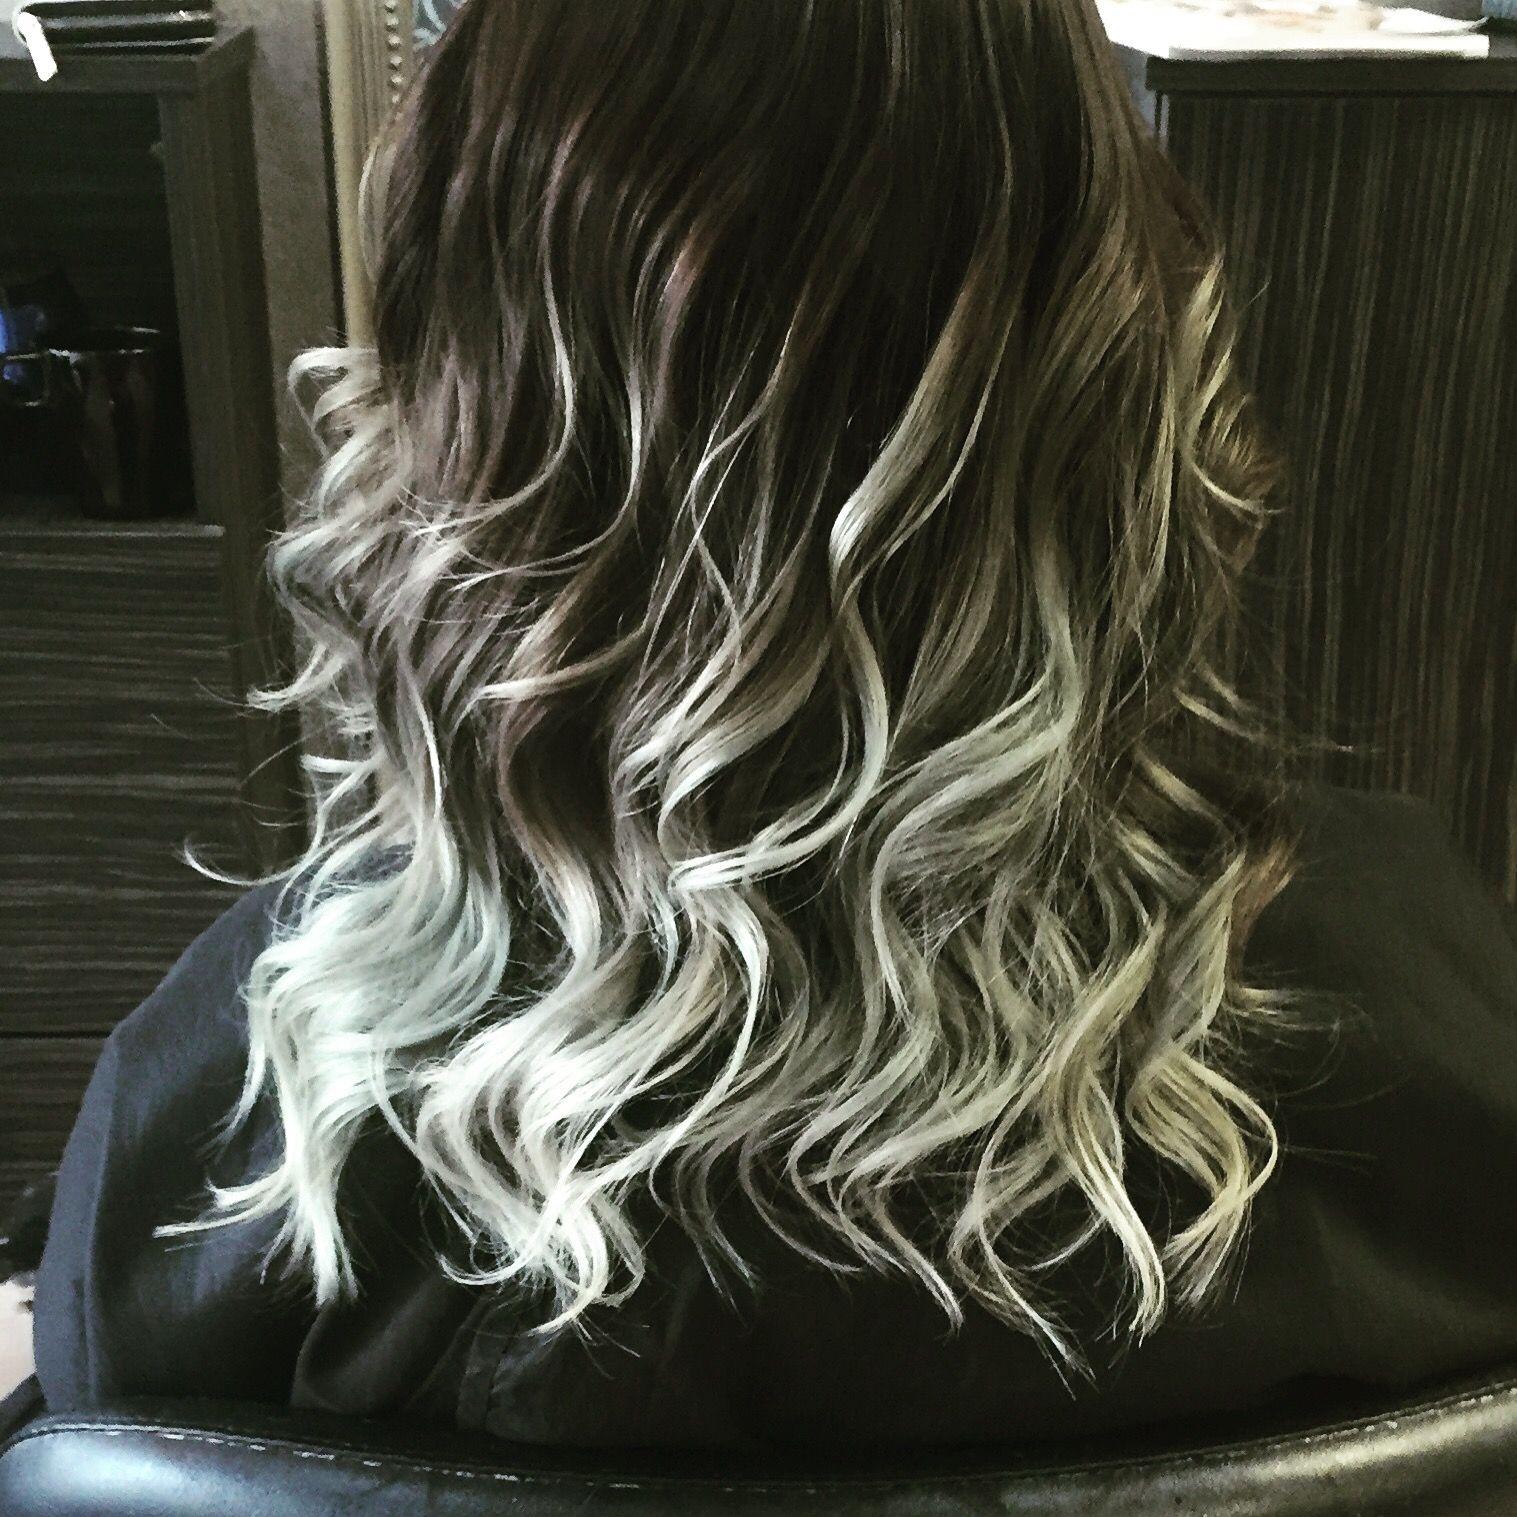 Hair today at Pout! 🔮💋💁 #blackgreyombre #hairdresser #hairfashion #hairstyle #hairgoals #hairofinstagram #amazing #hairdye #haircolor #magic #beautiful #inlove #hairoftheday #hairsalon #hairlife #colors #galaxy #goals #northernireland #lisburn #cosmichair